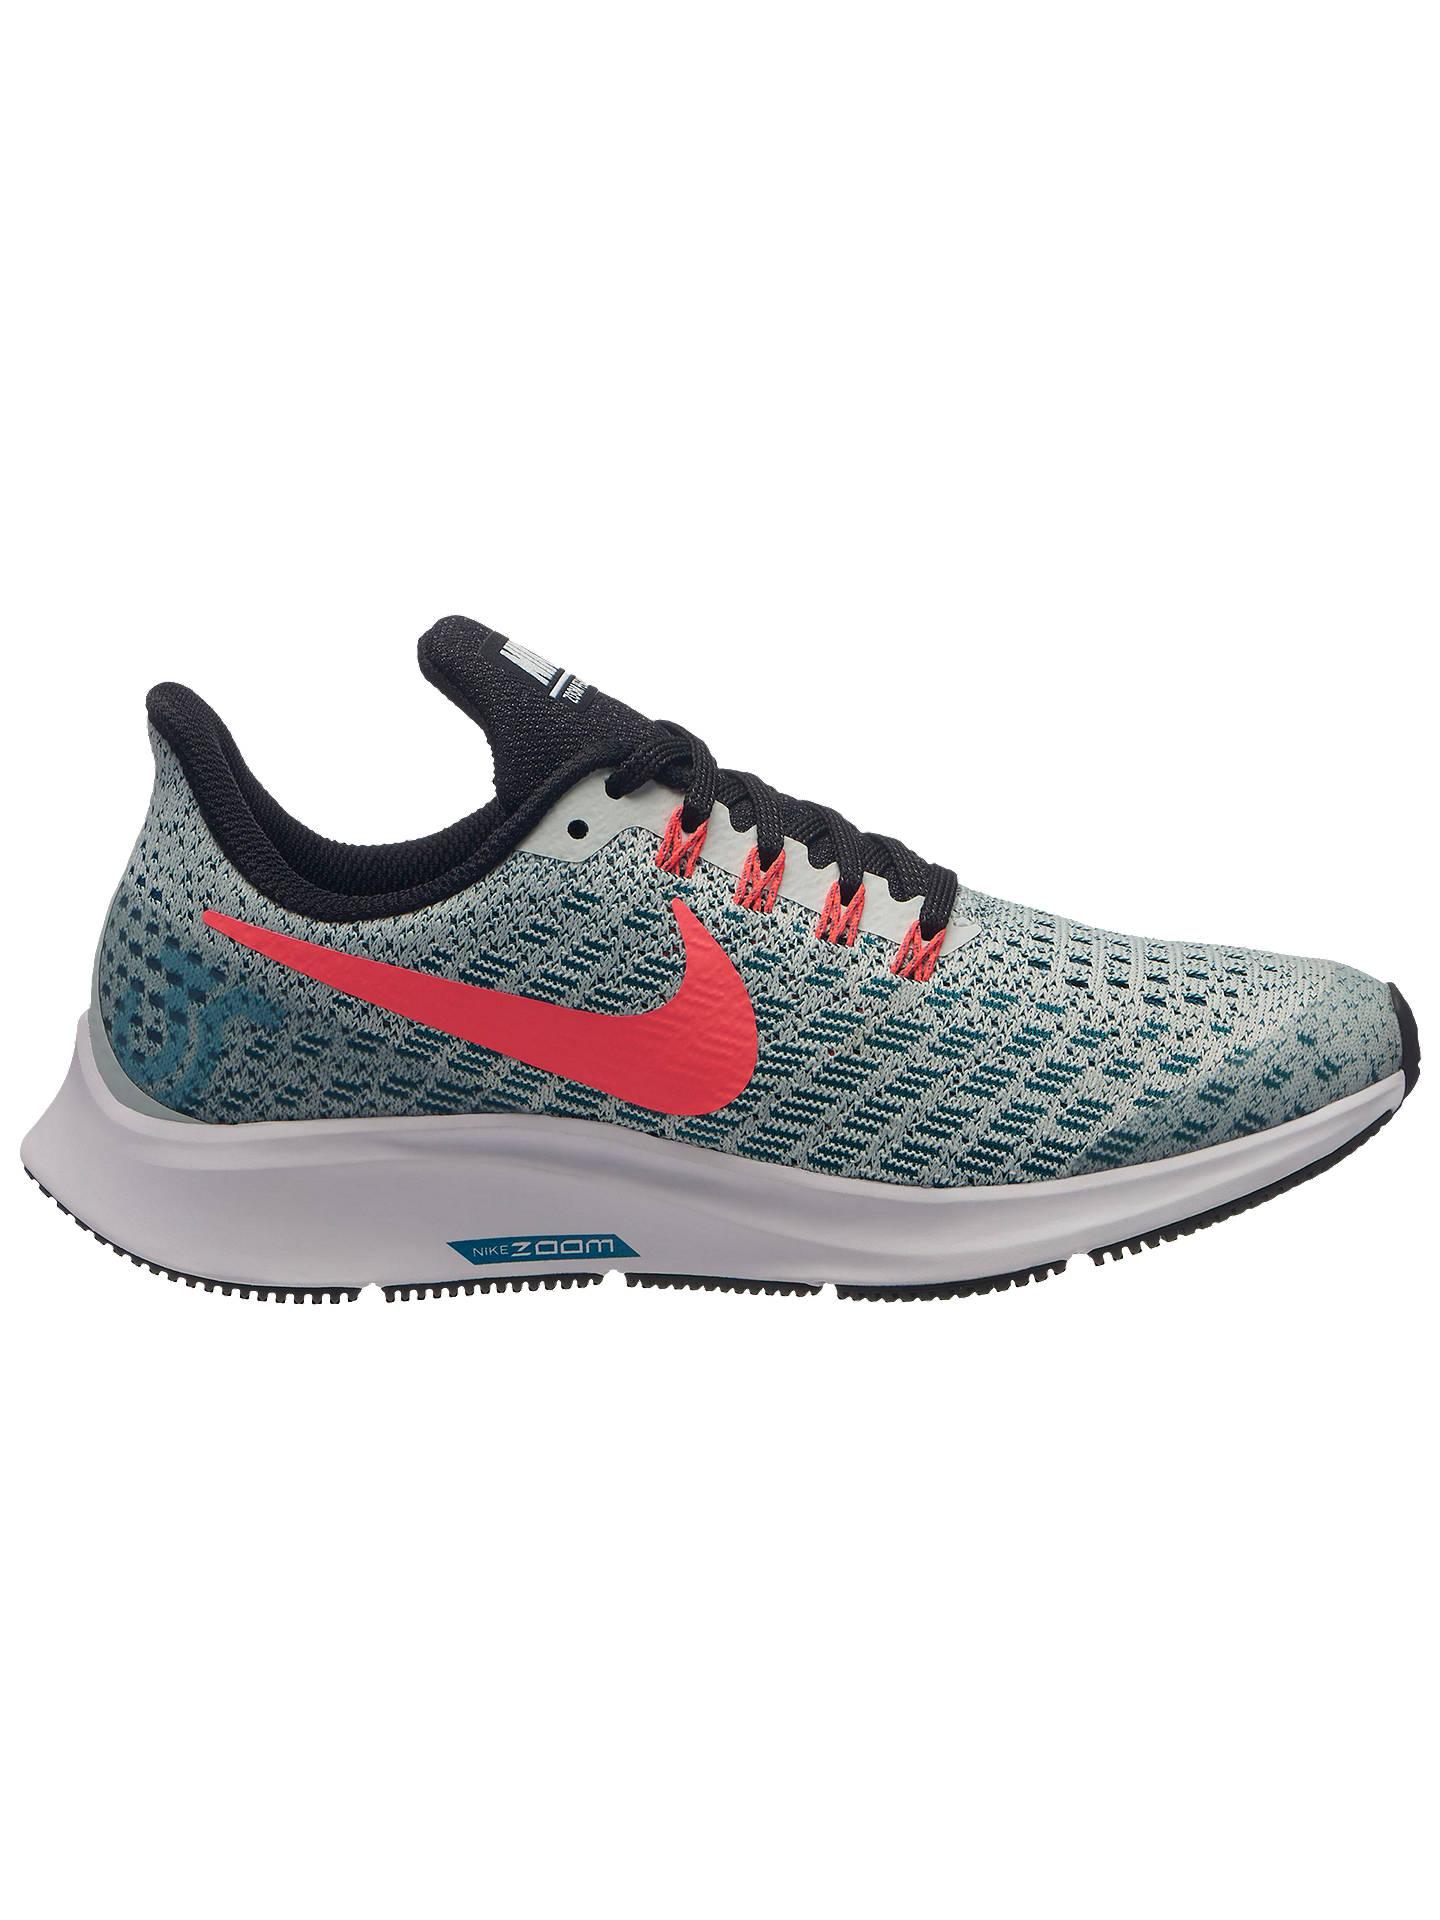 a658b4d56a76 BuyNike Children s Air Zoom Pegasus 35 Running Shoes